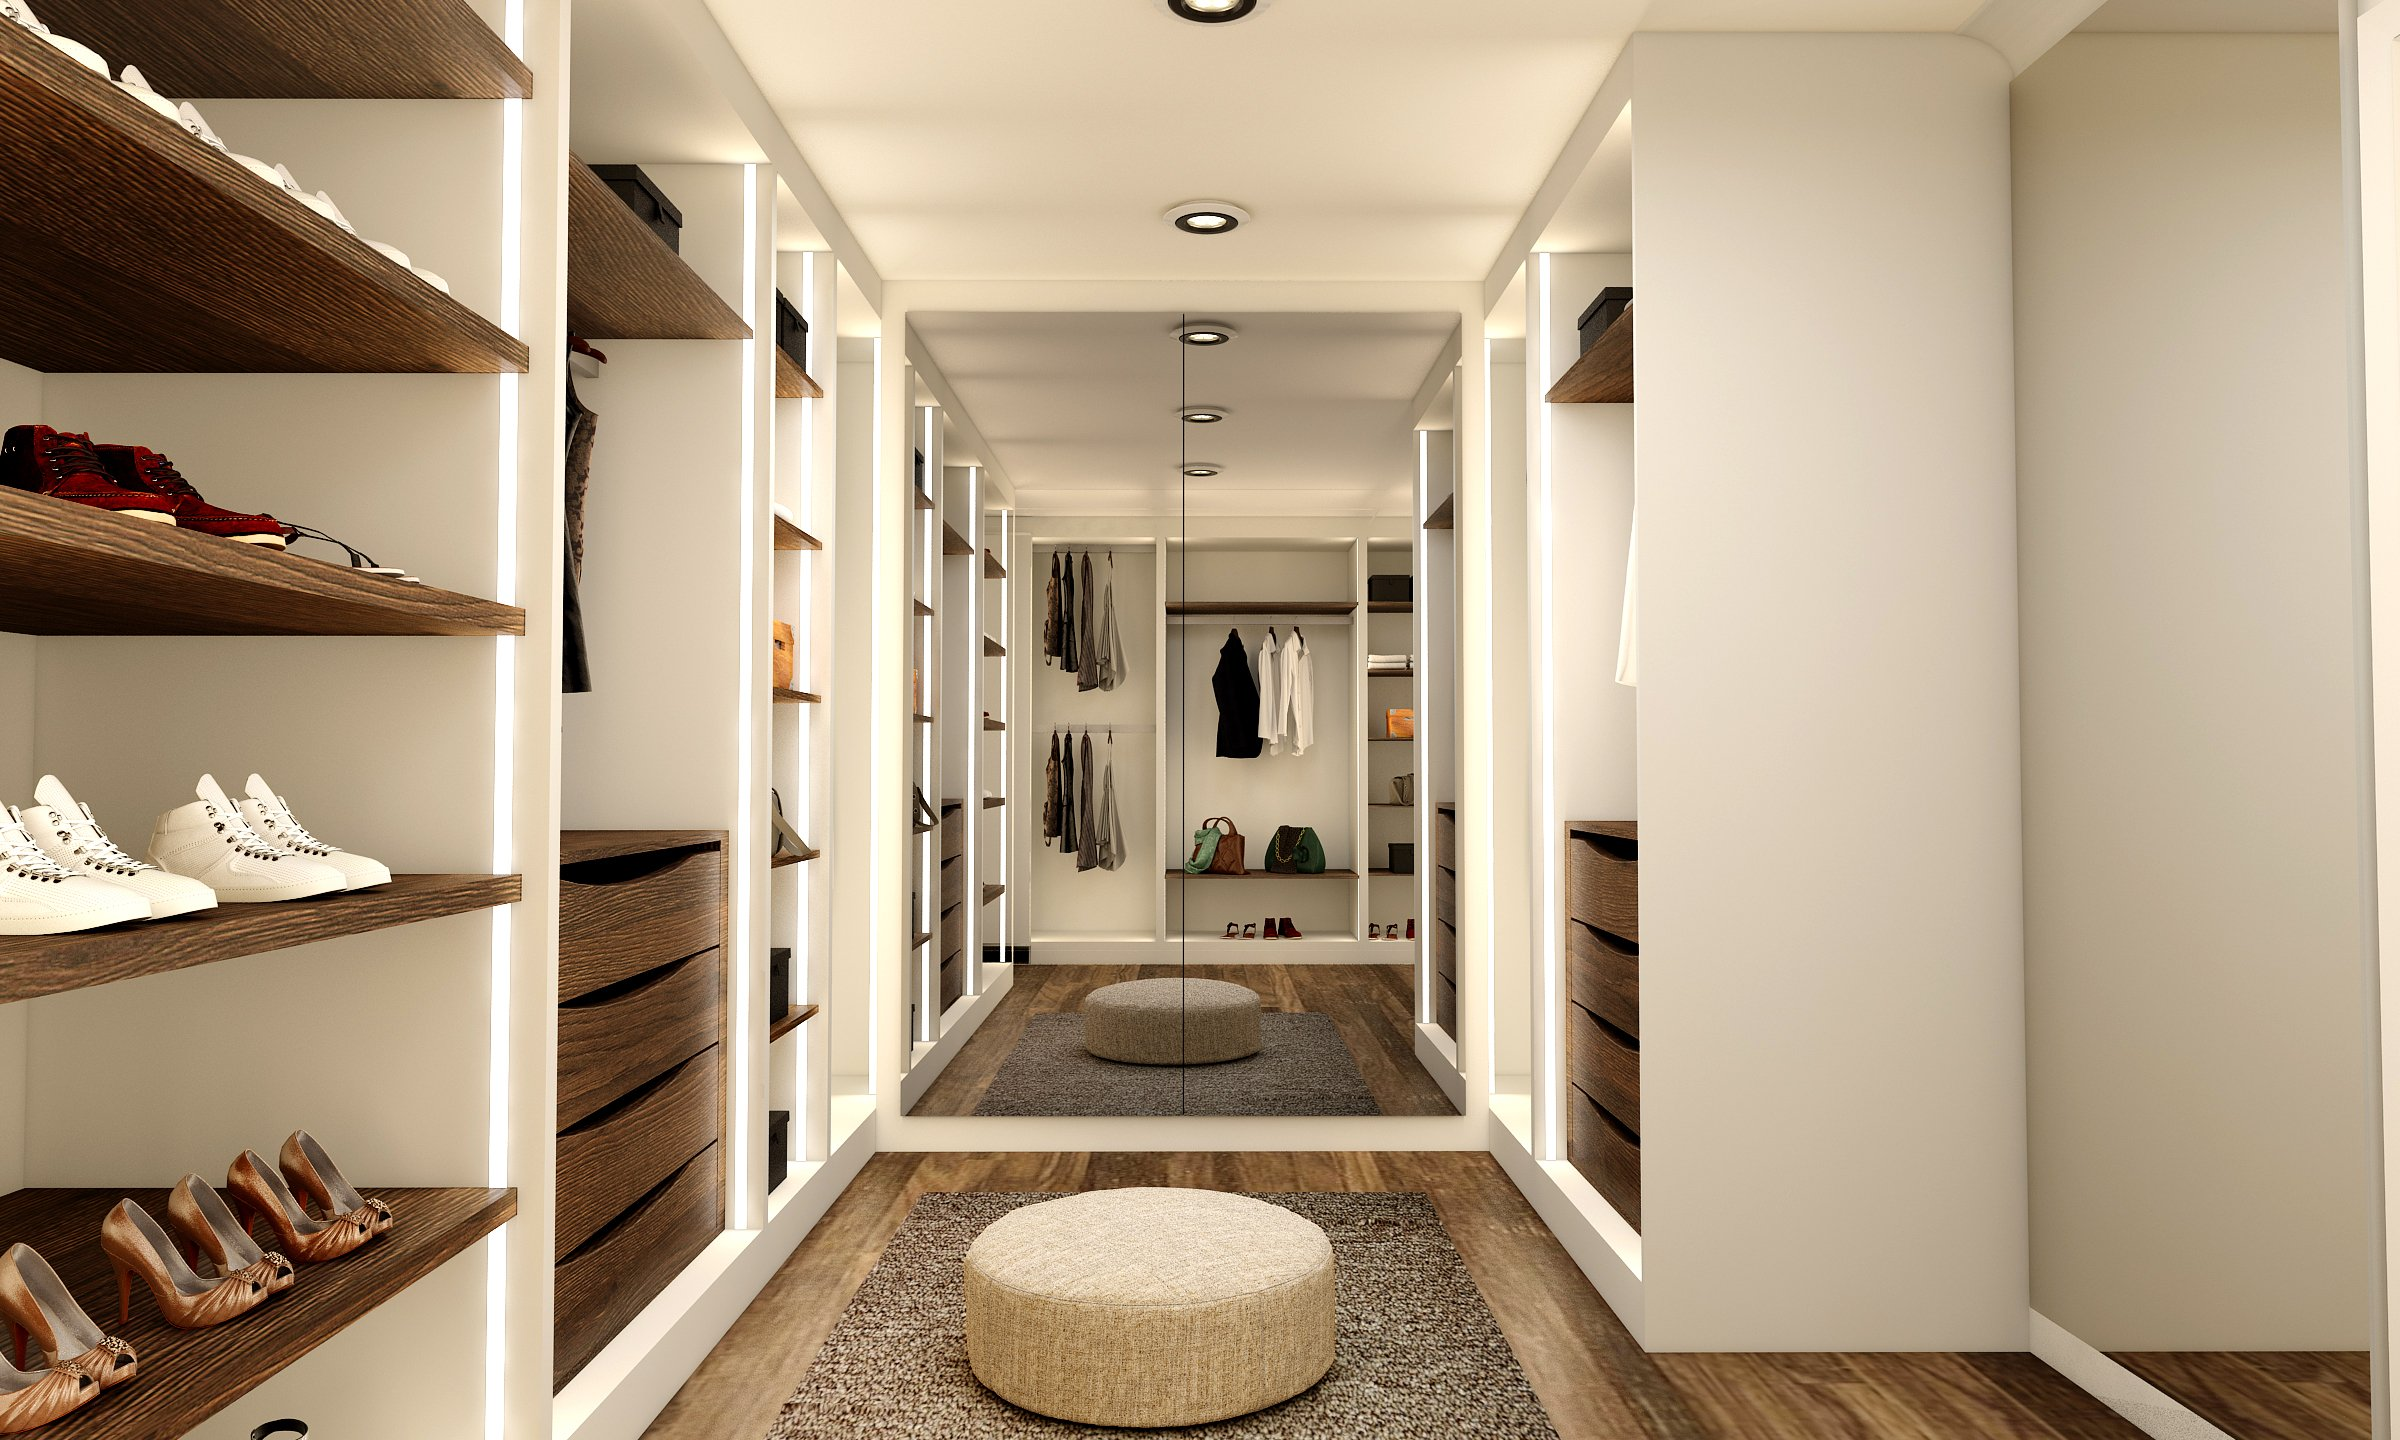 Modern Small Walk-in Wardrobe With Mirrored Wardrobe Combination